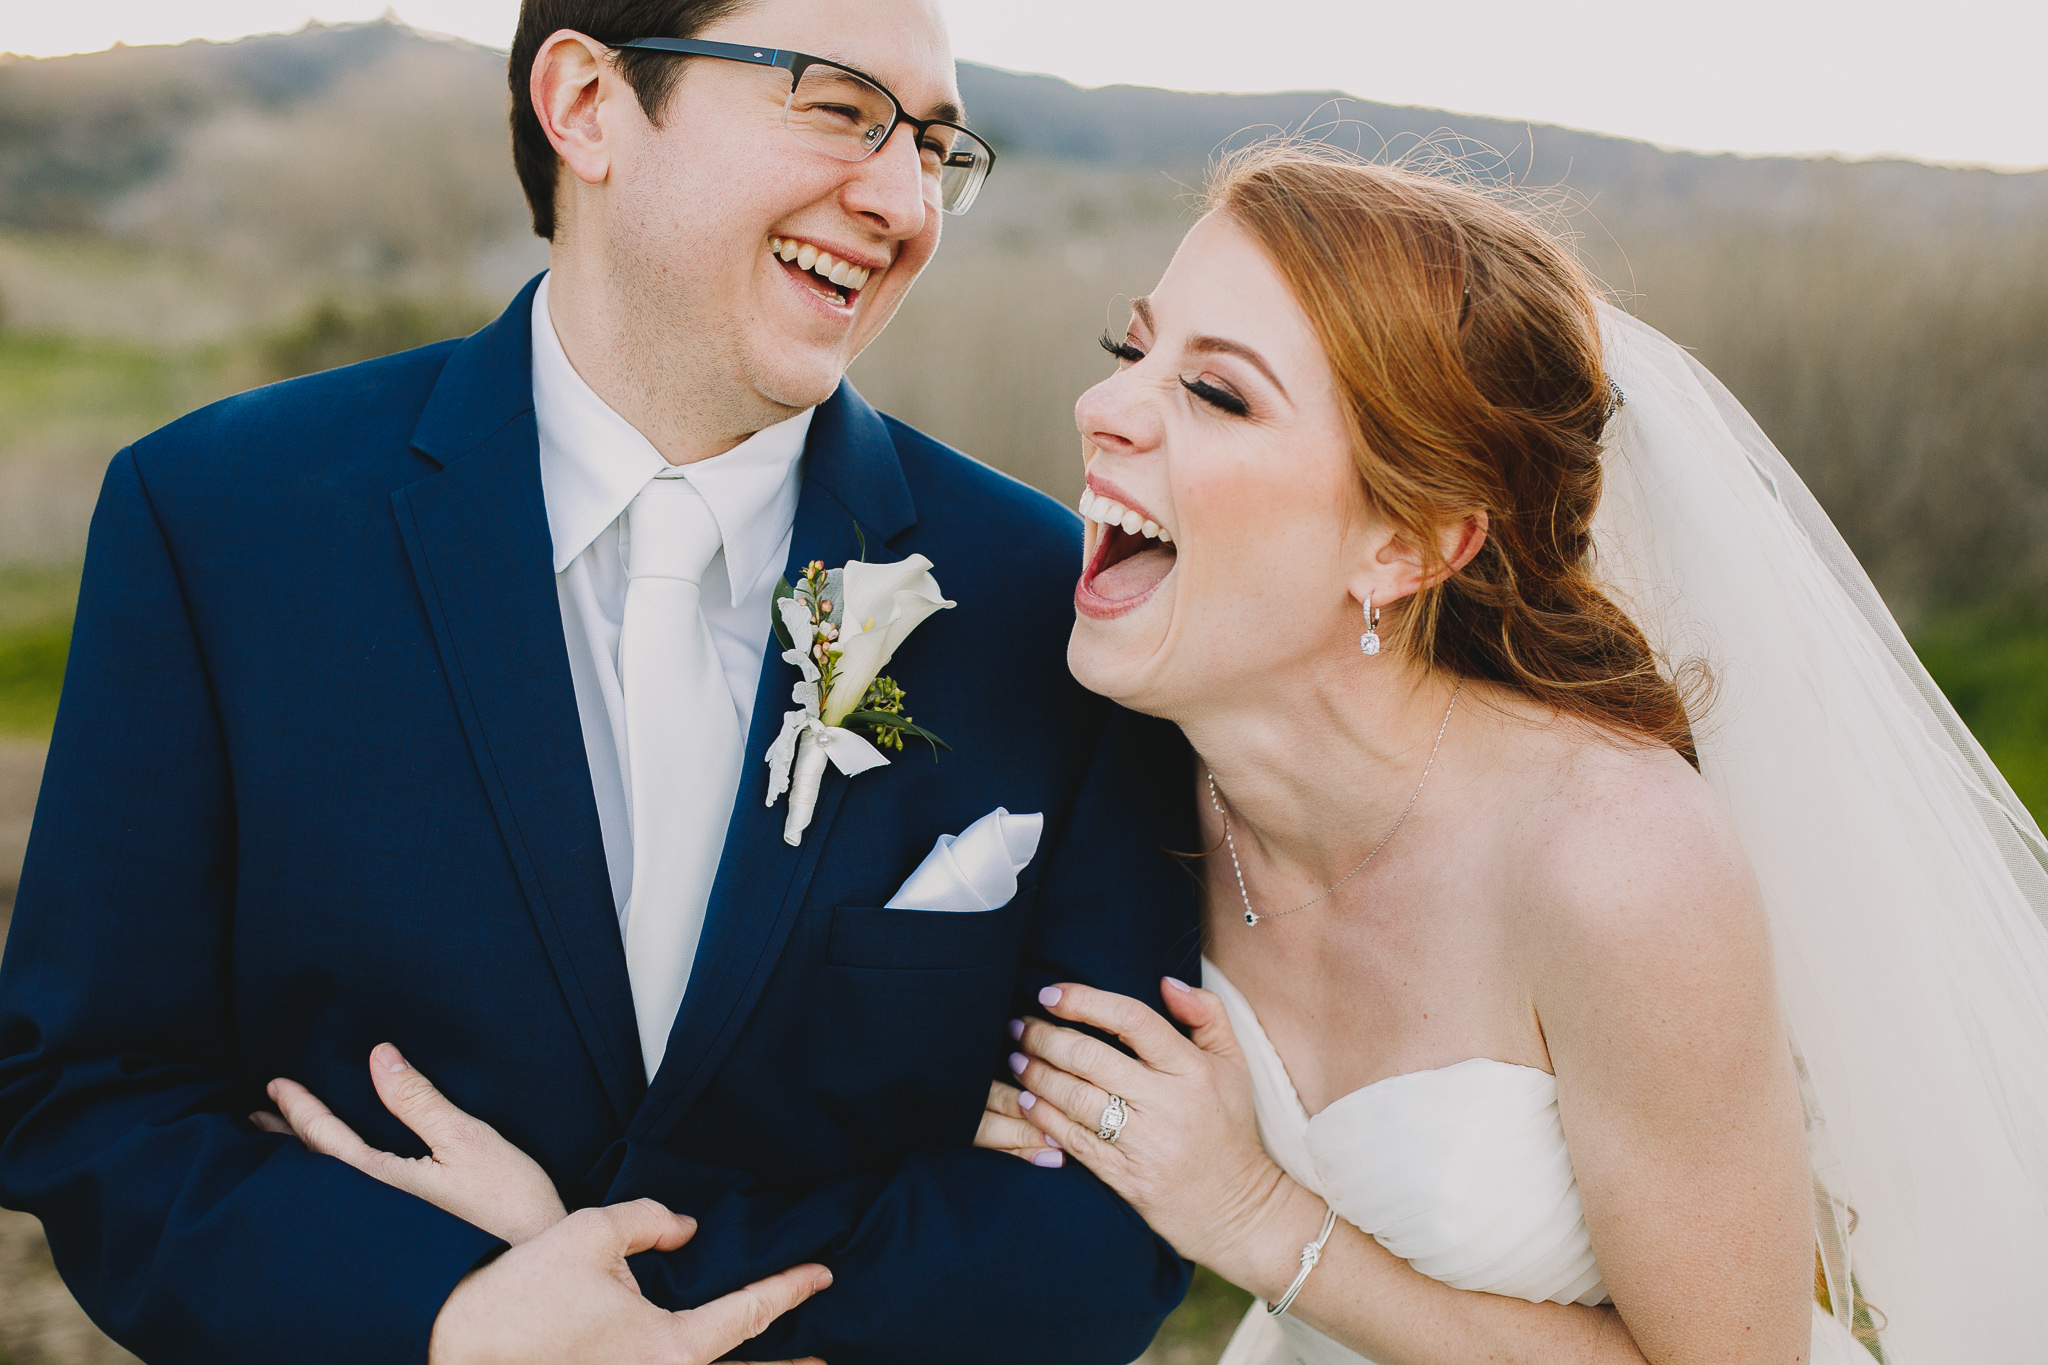 Archer Inspired Photography San Juan Oaks Golf Club Hollister California NorCal Wedding Lifestyle Photographer-646.jpg